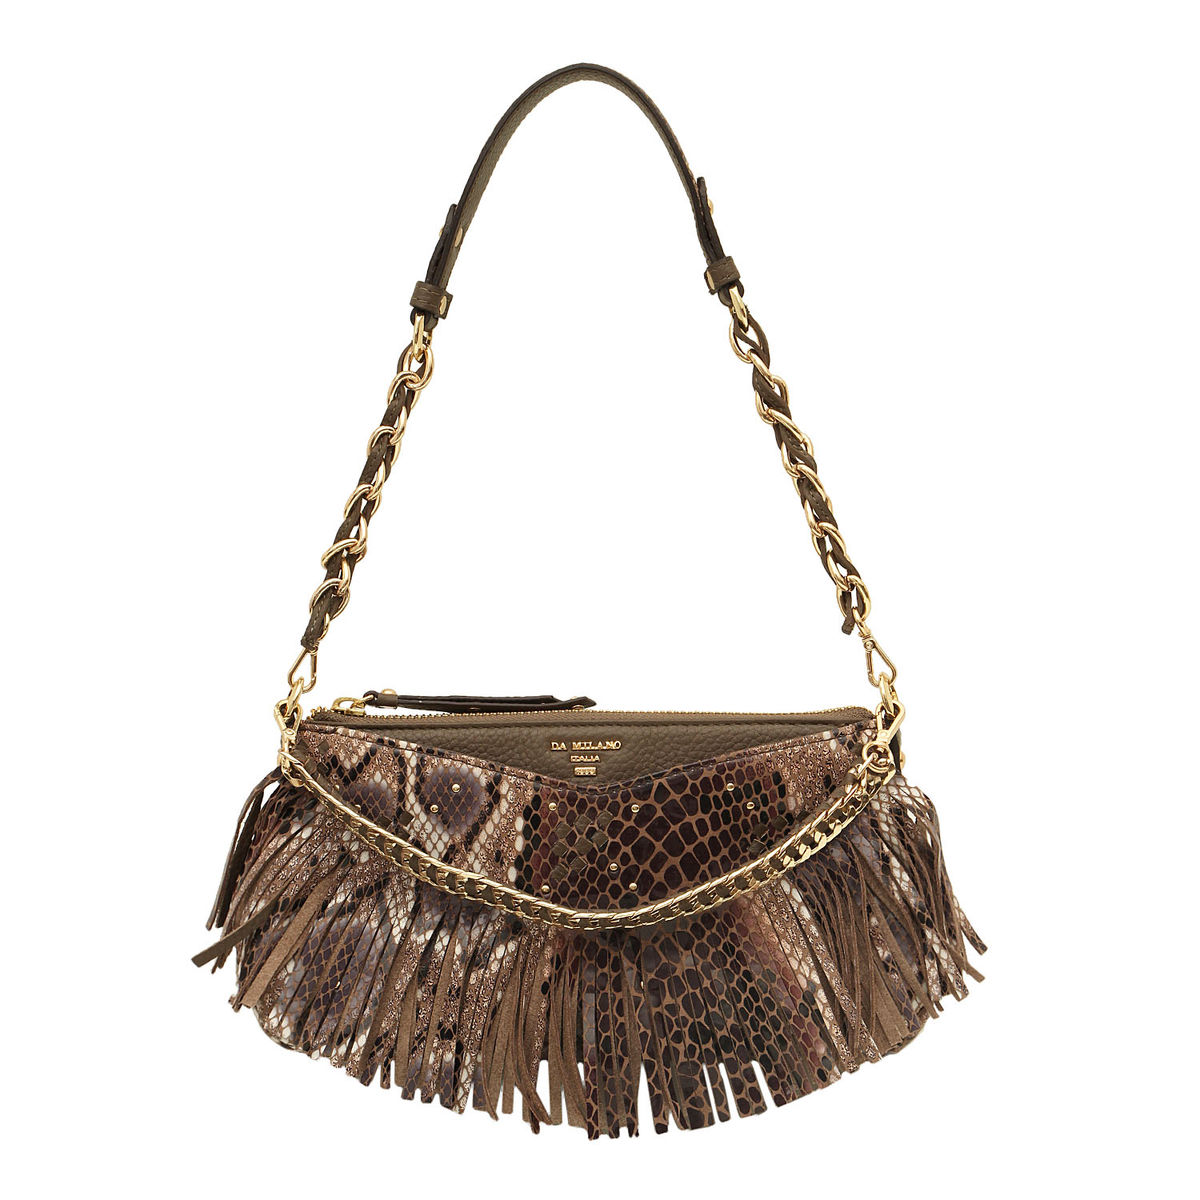 1d402daa80 ... Da Milano Brown White Long Handle Bag. sold-out-image zoom Da ...